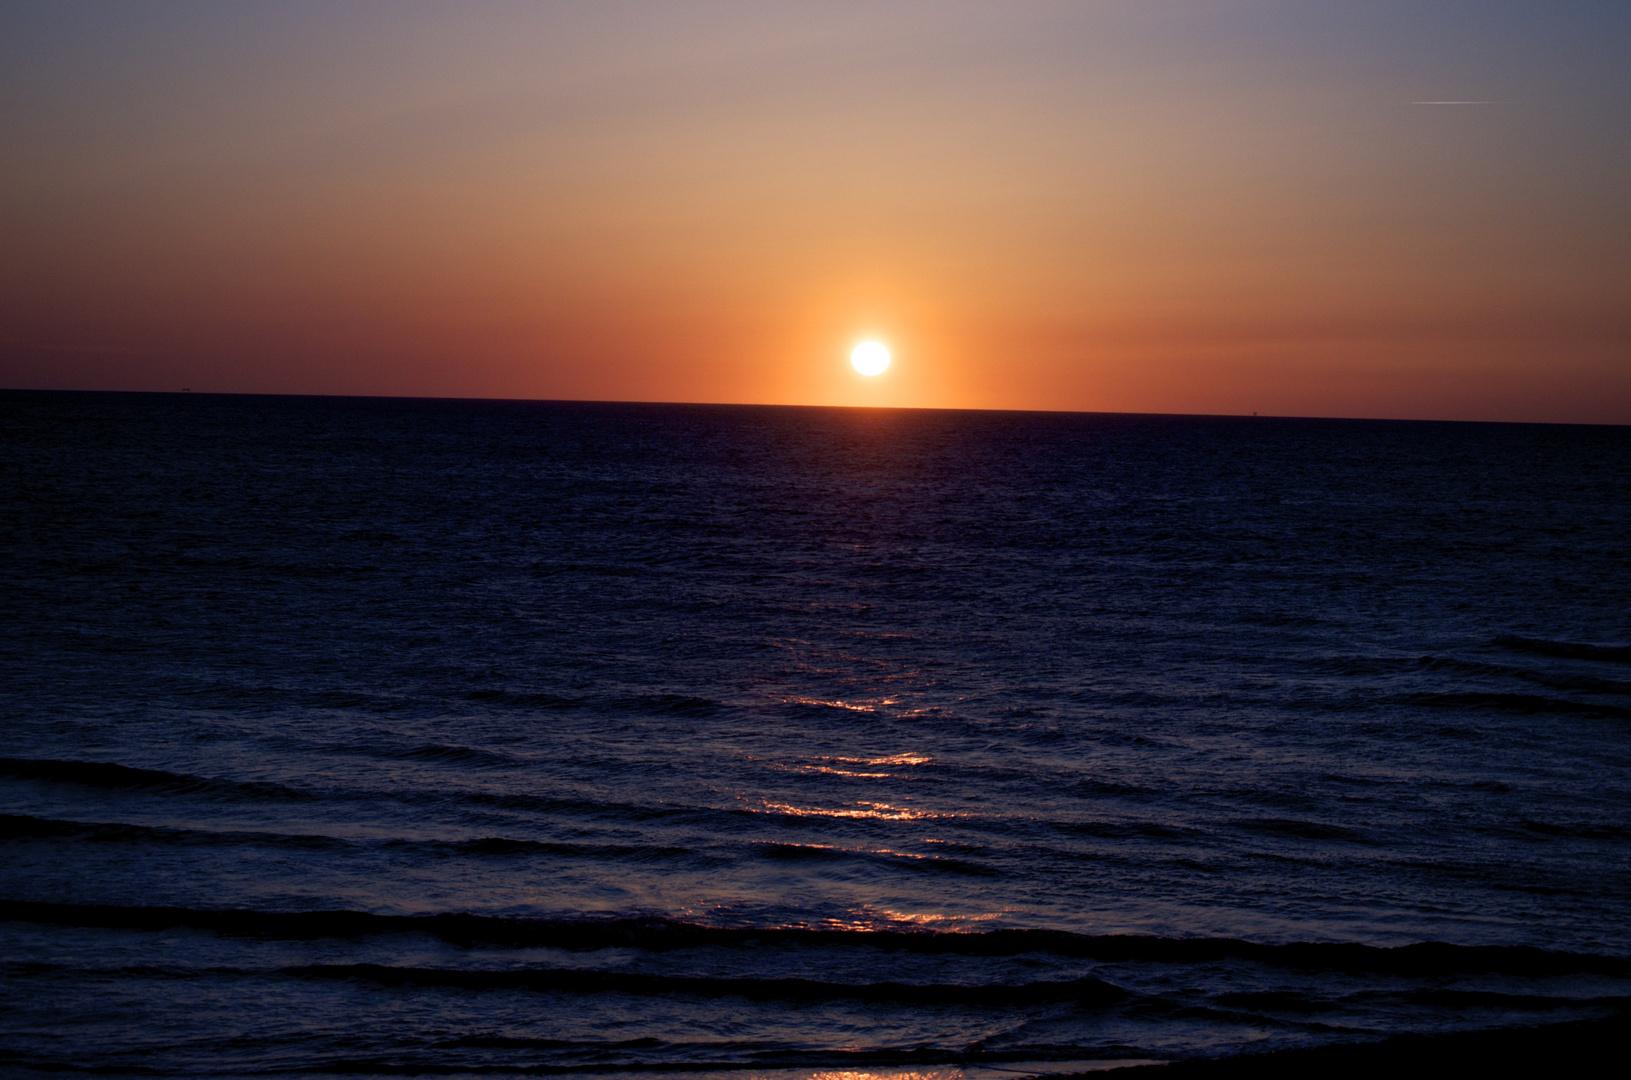 Sundown at Camperduin